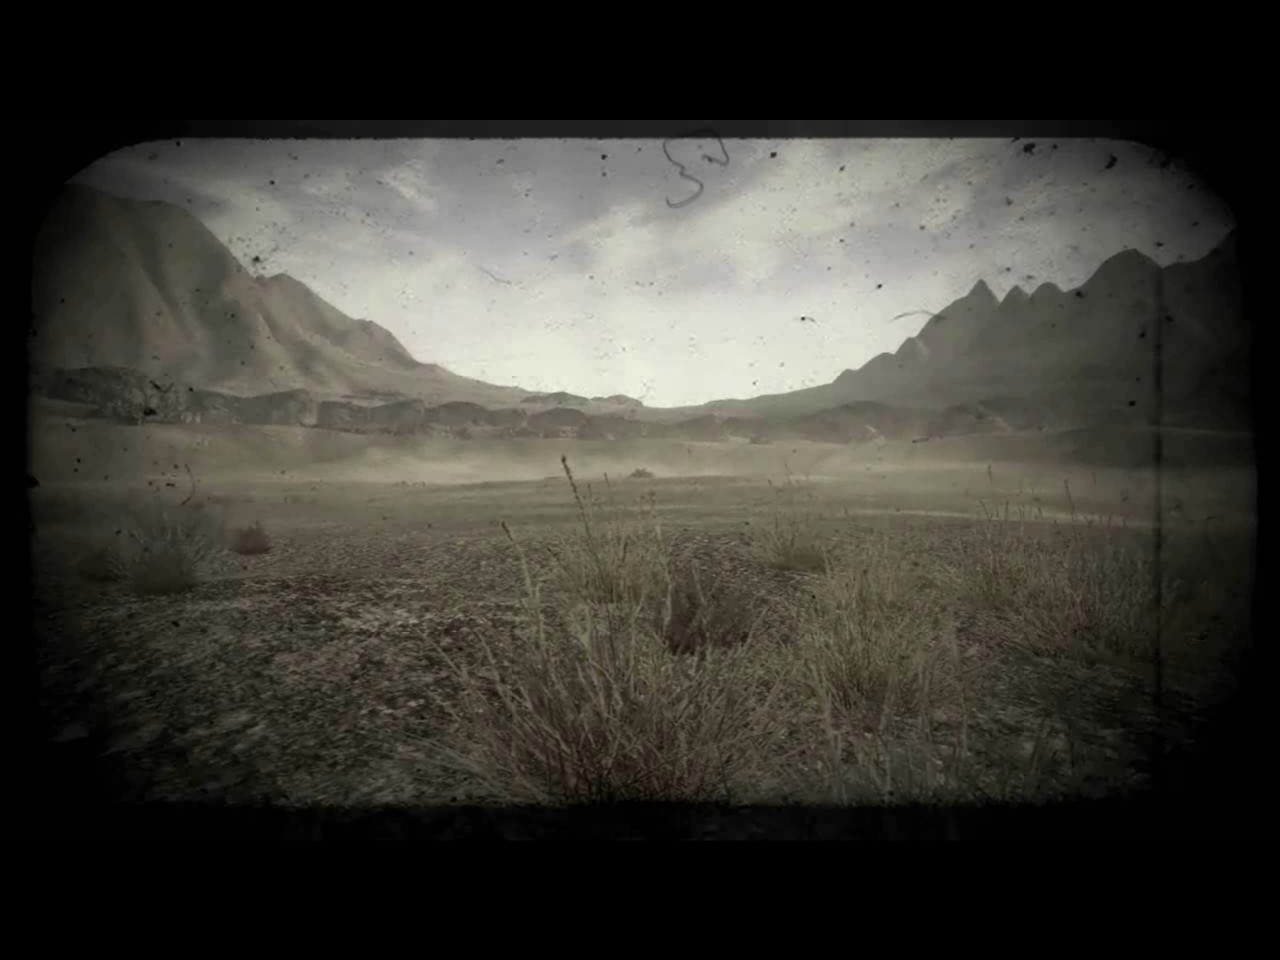 20190101090540_1.jpg - Fallout: New Vegas